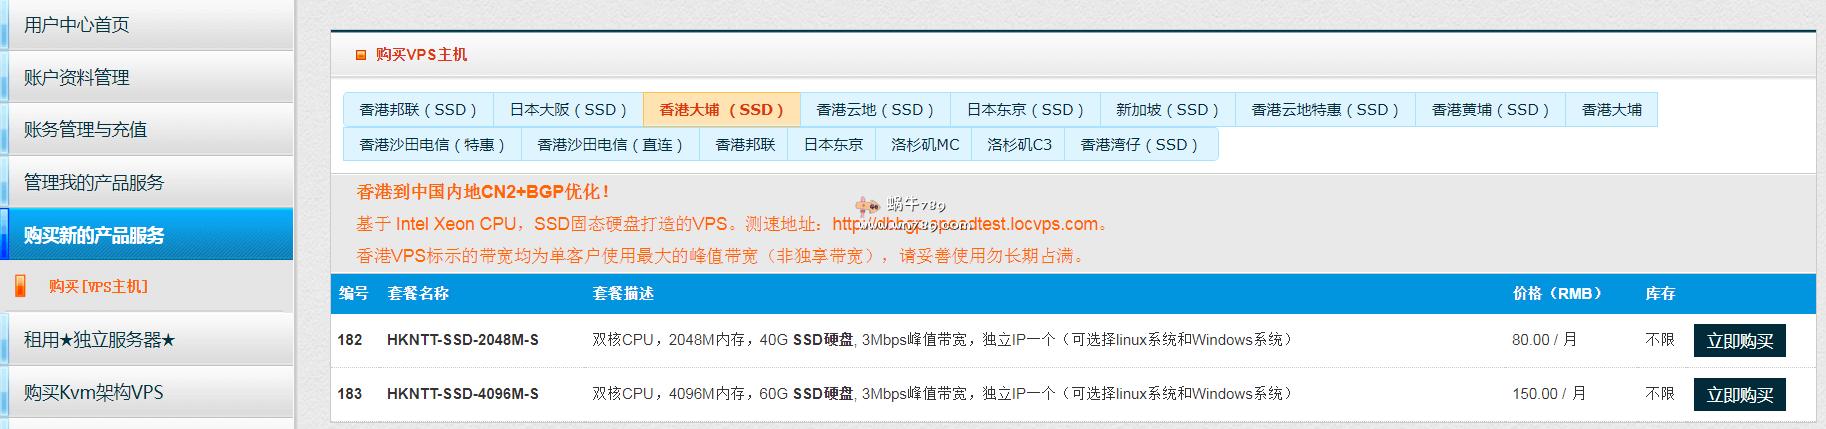 LOCVPS香港大埔CN2 VPS补货:2核2G、终身8折、64元/月,免备案建站